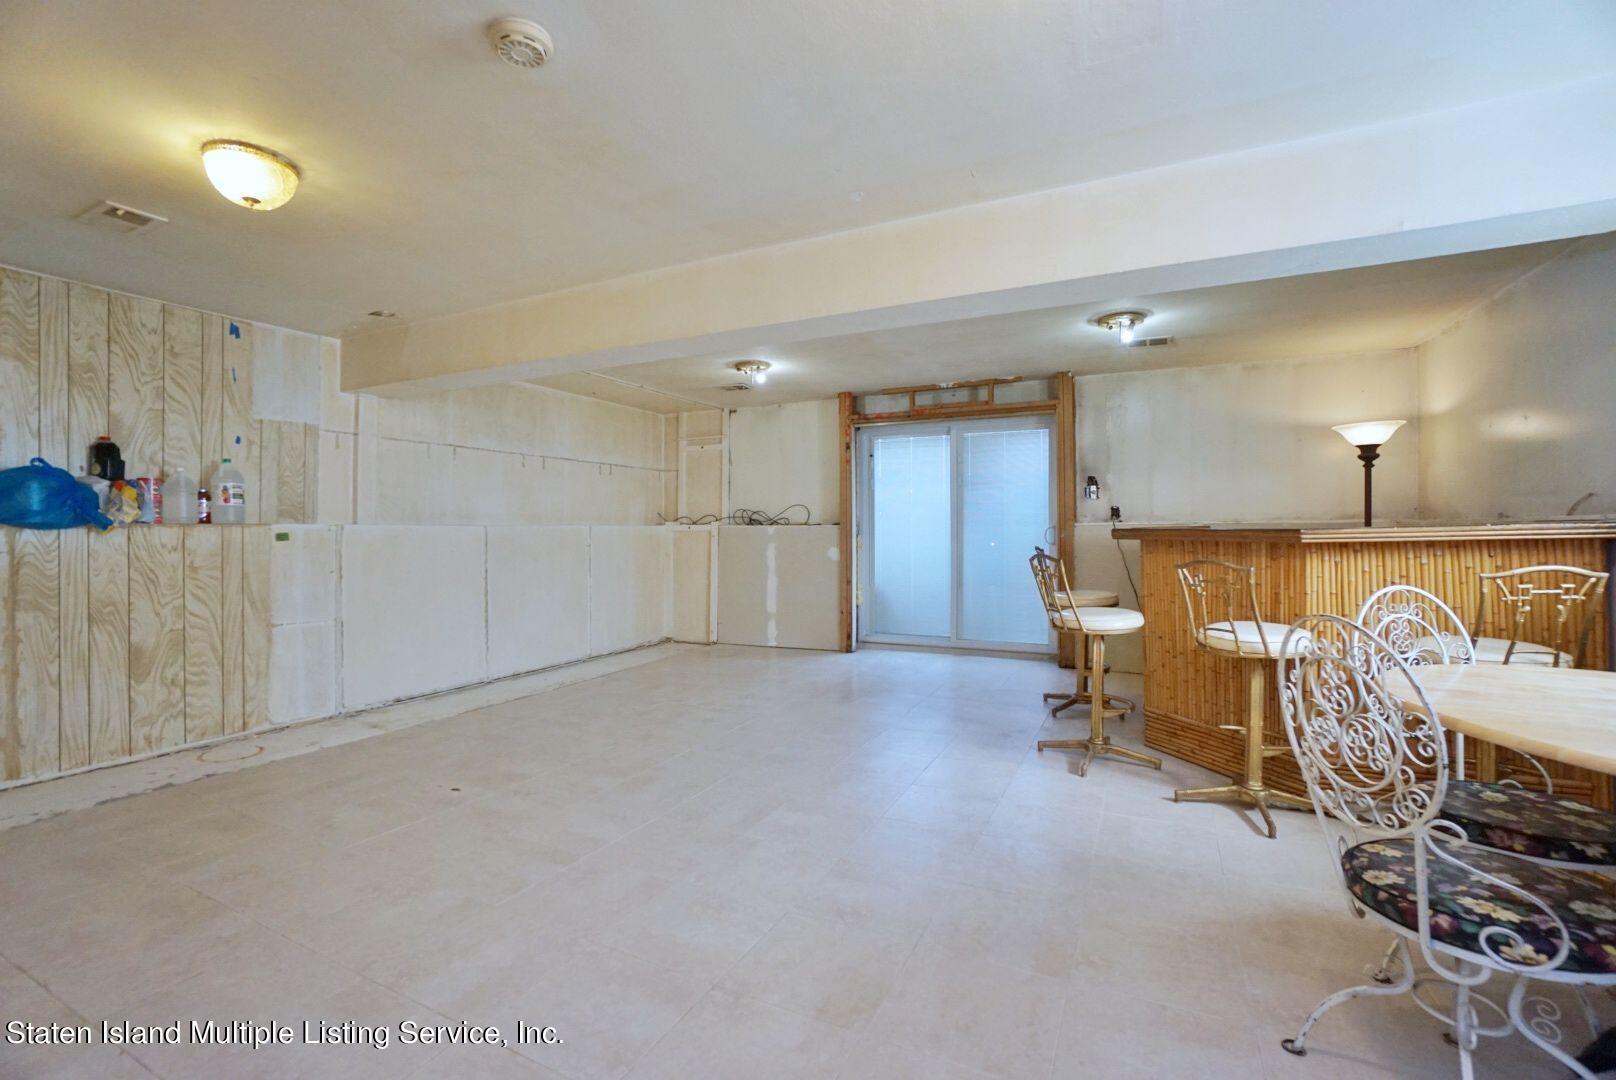 Single Family - Detached 94 Cranford Avenue  Staten Island, NY 10306, MLS-1146620-34